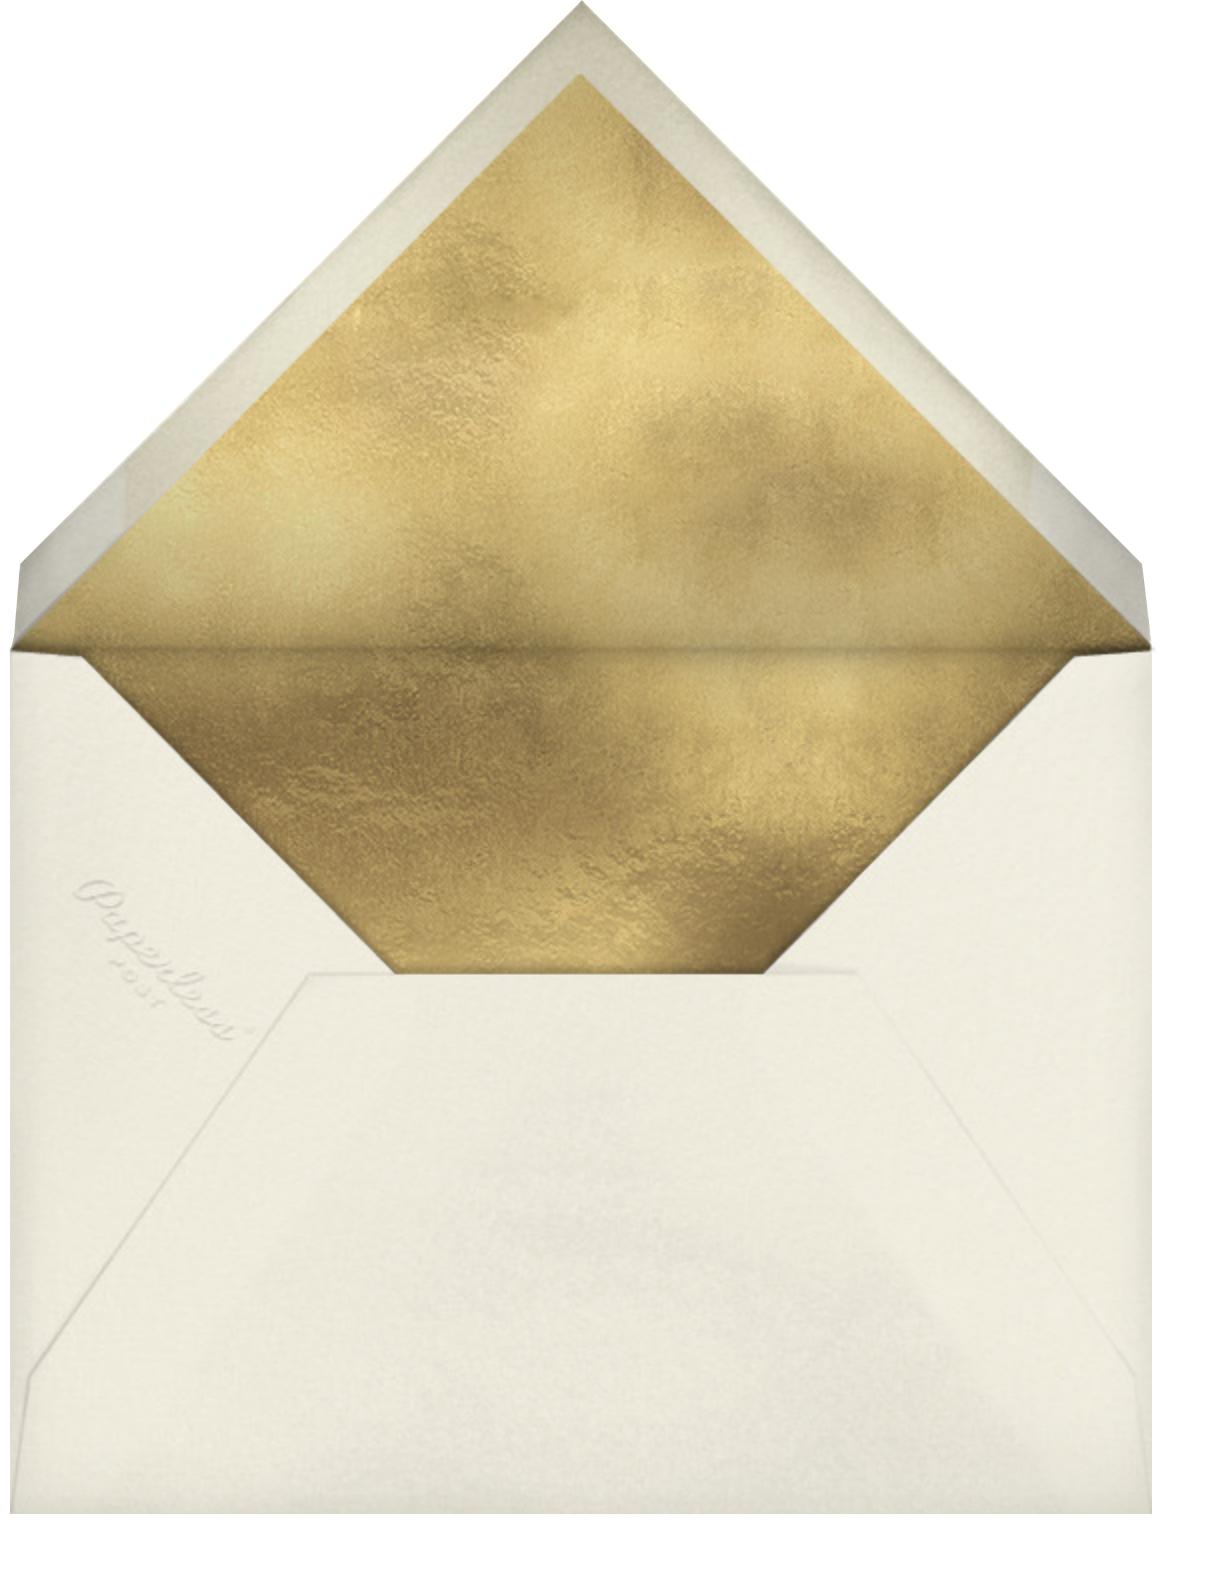 Glam Croc - Gold - kate spade new york - Adult birthday - envelope back